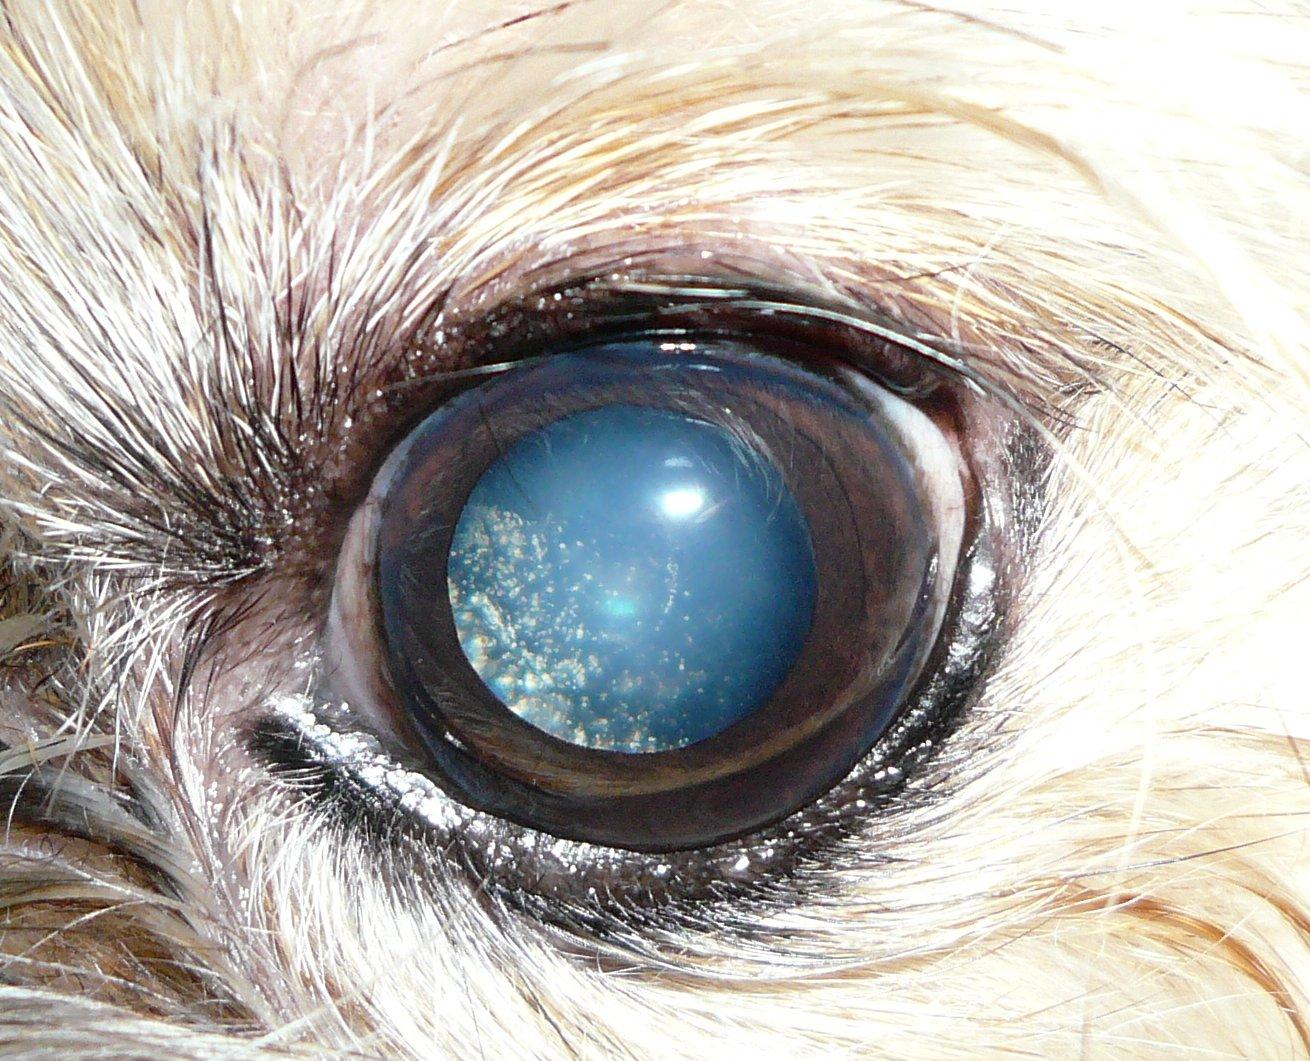 Dogs Eye Is Swollen Tree Bark Texture Red